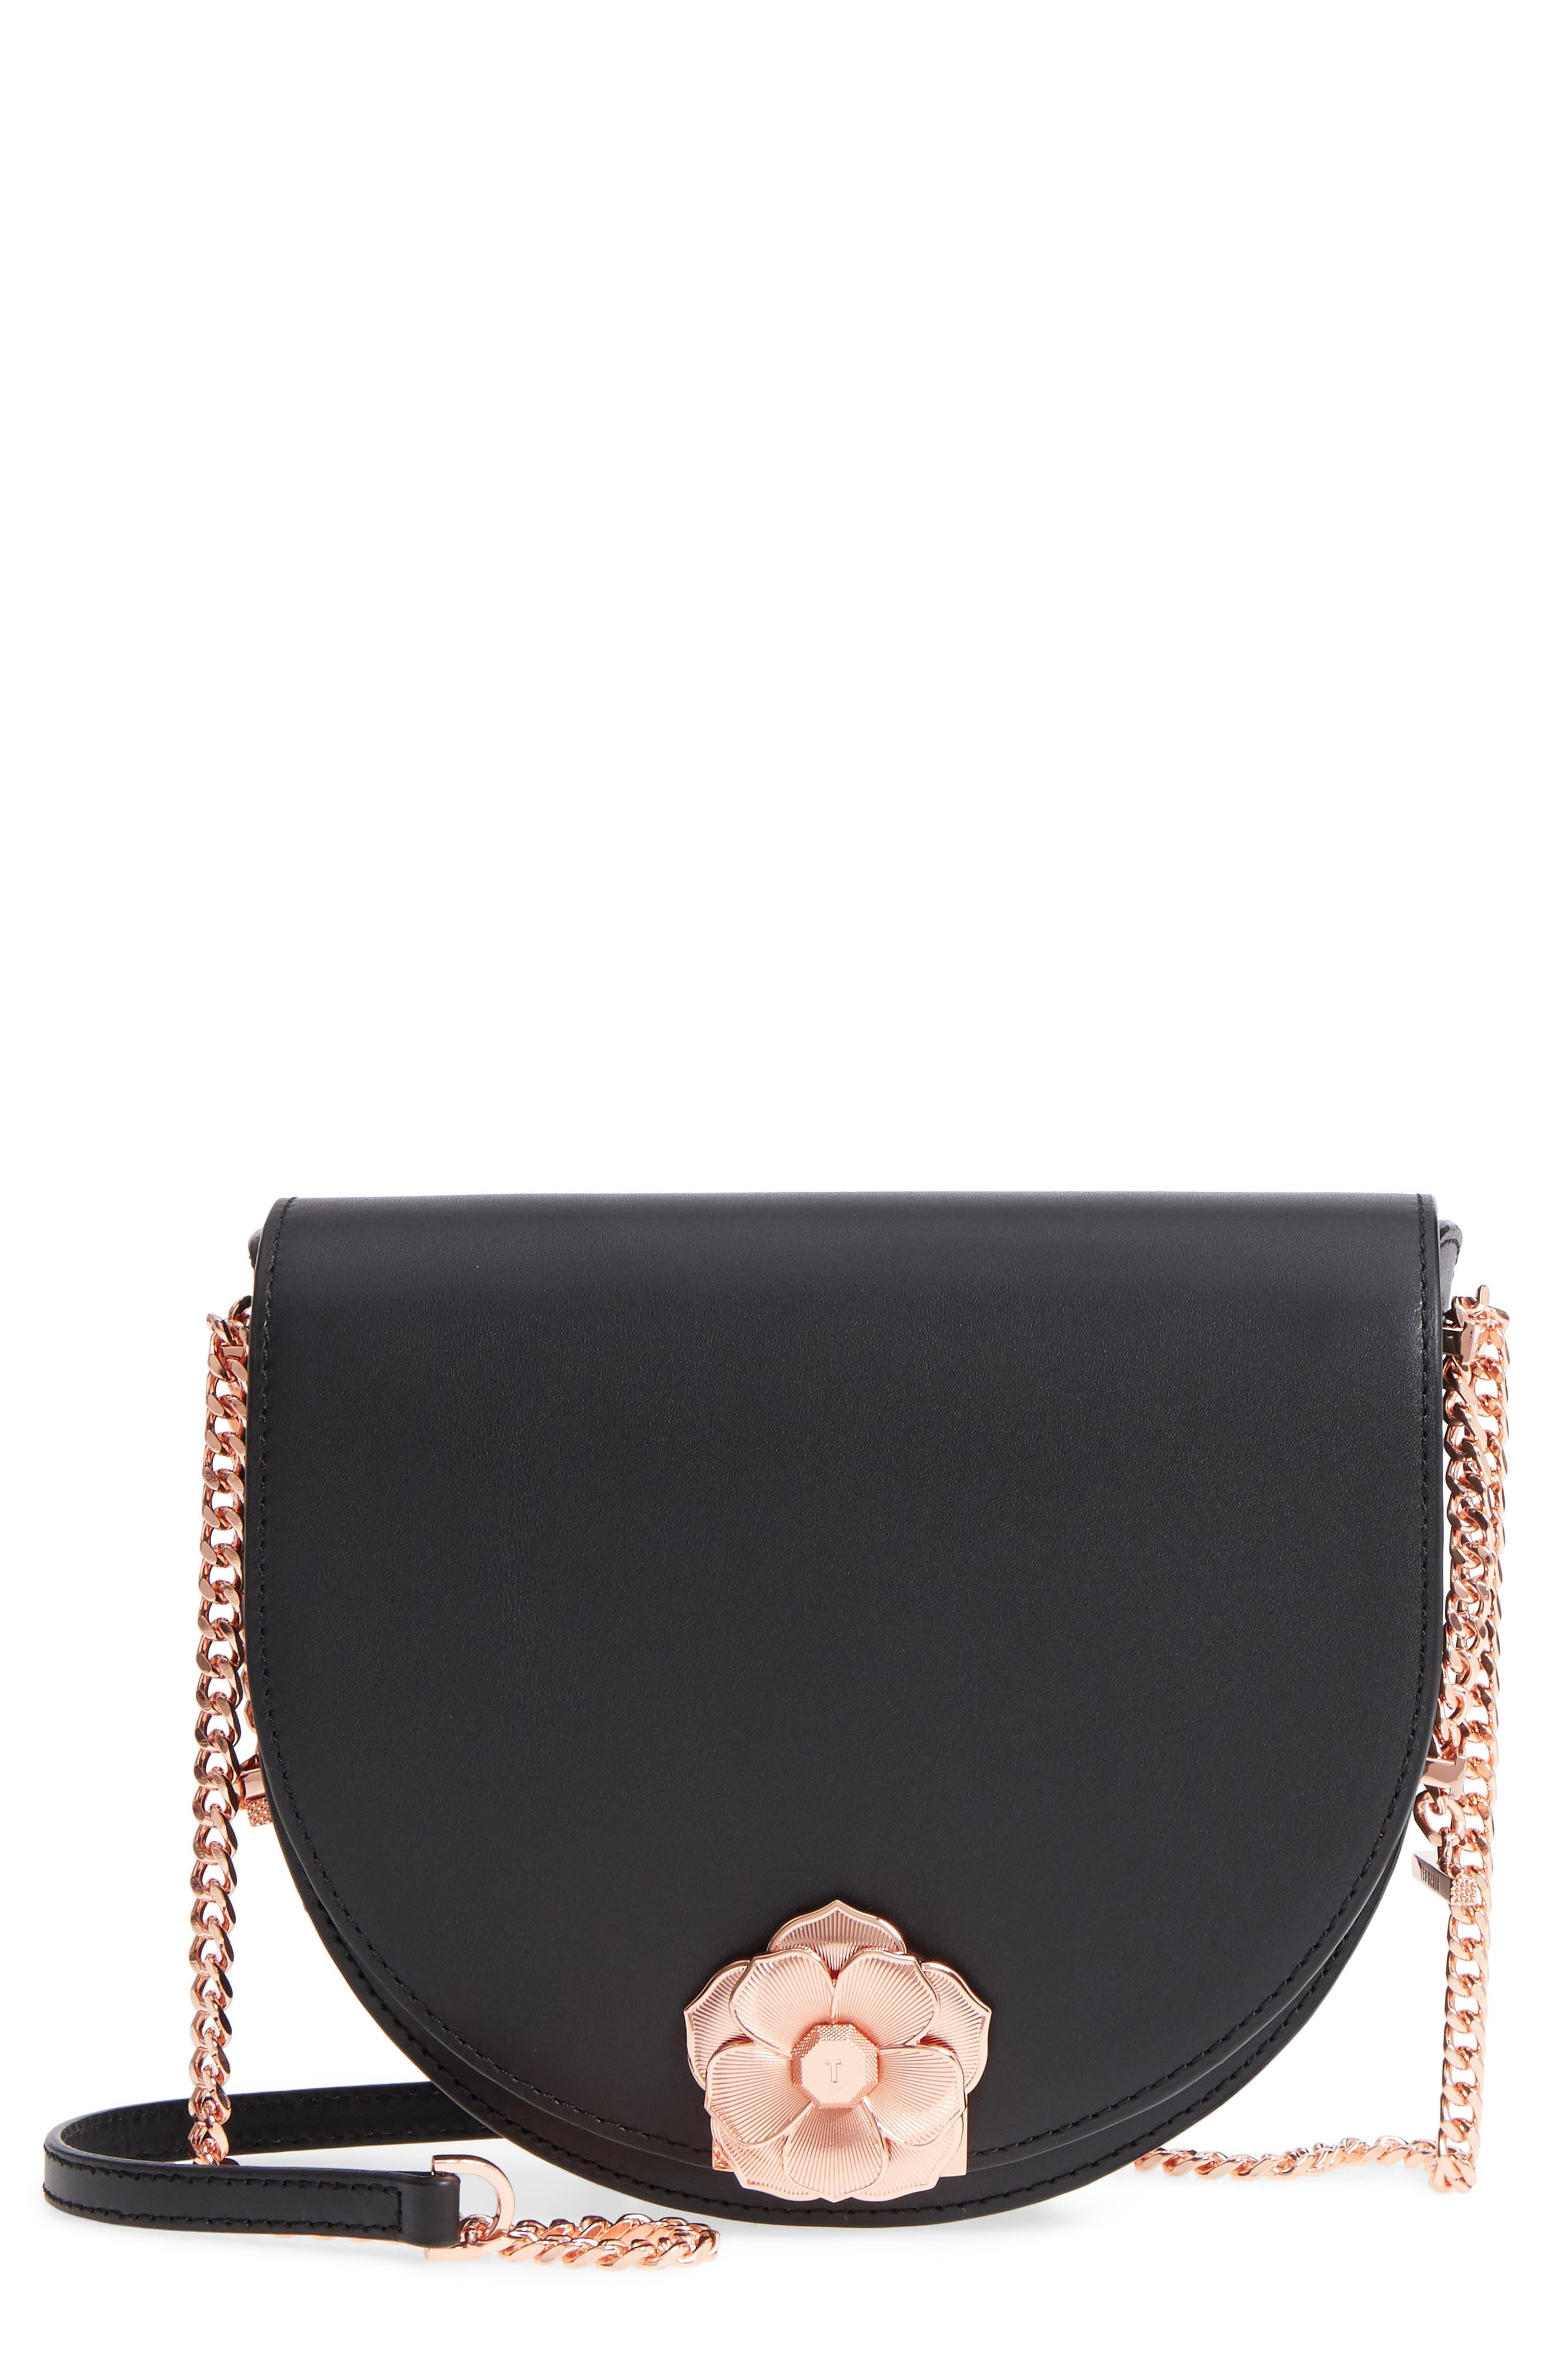 Roslyn Leather Crossbody Bag,                             Main thumbnail 1, color,                             Black